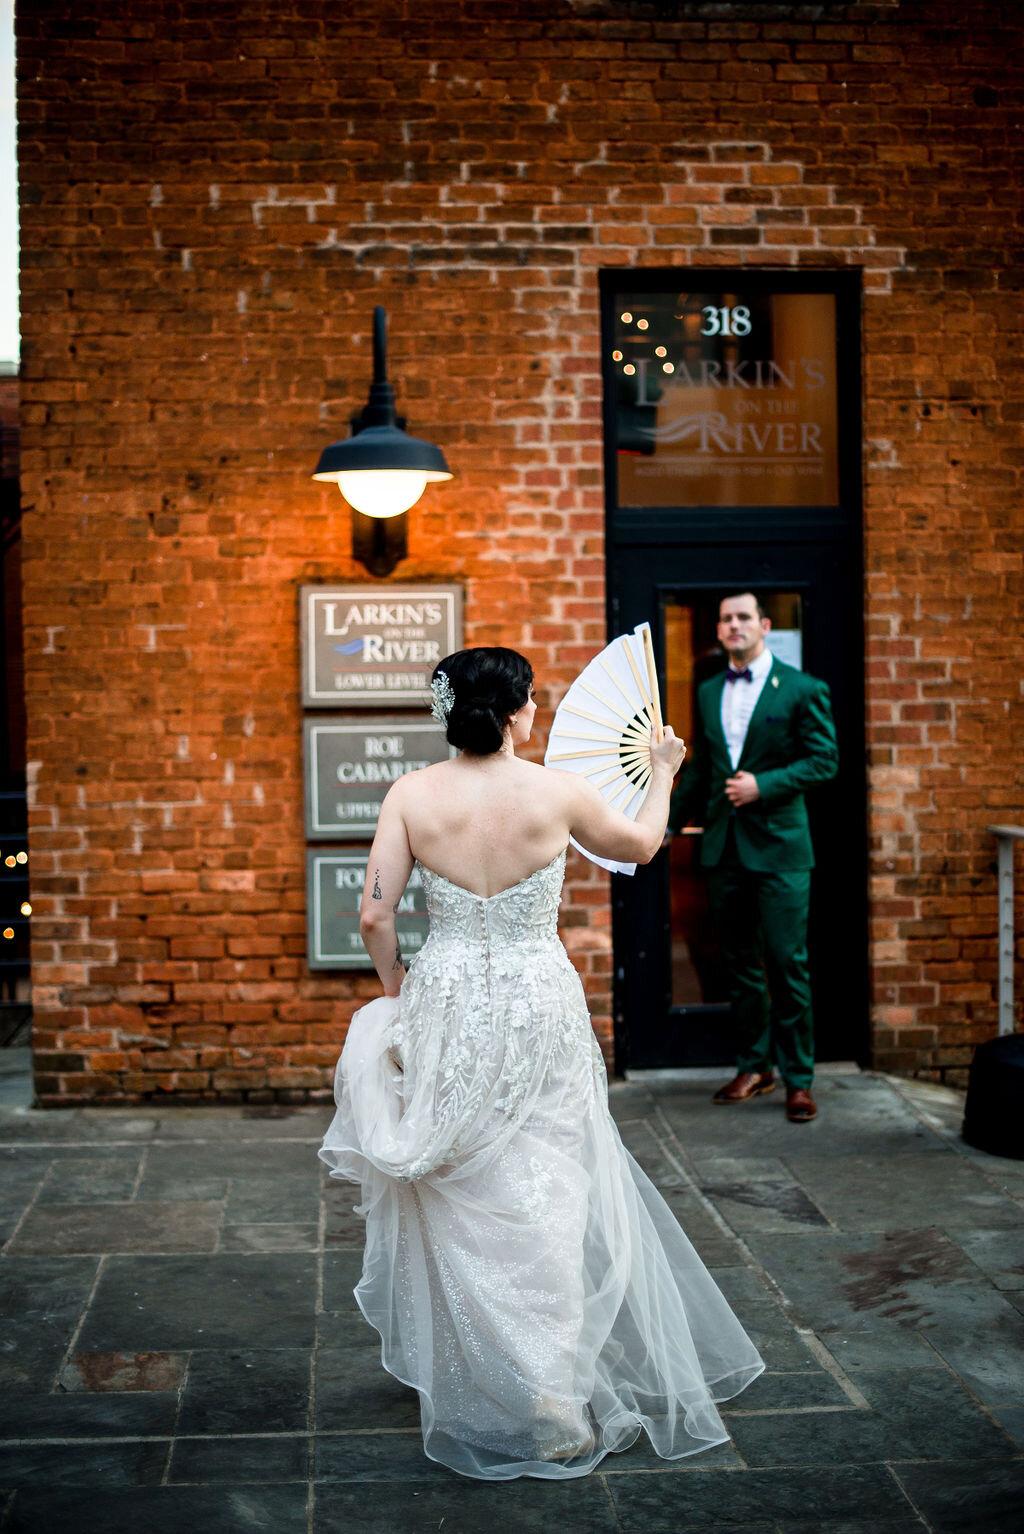 vibrant downtown wedding - LARKINS ON THE RIVER   GREENVILLE, SC